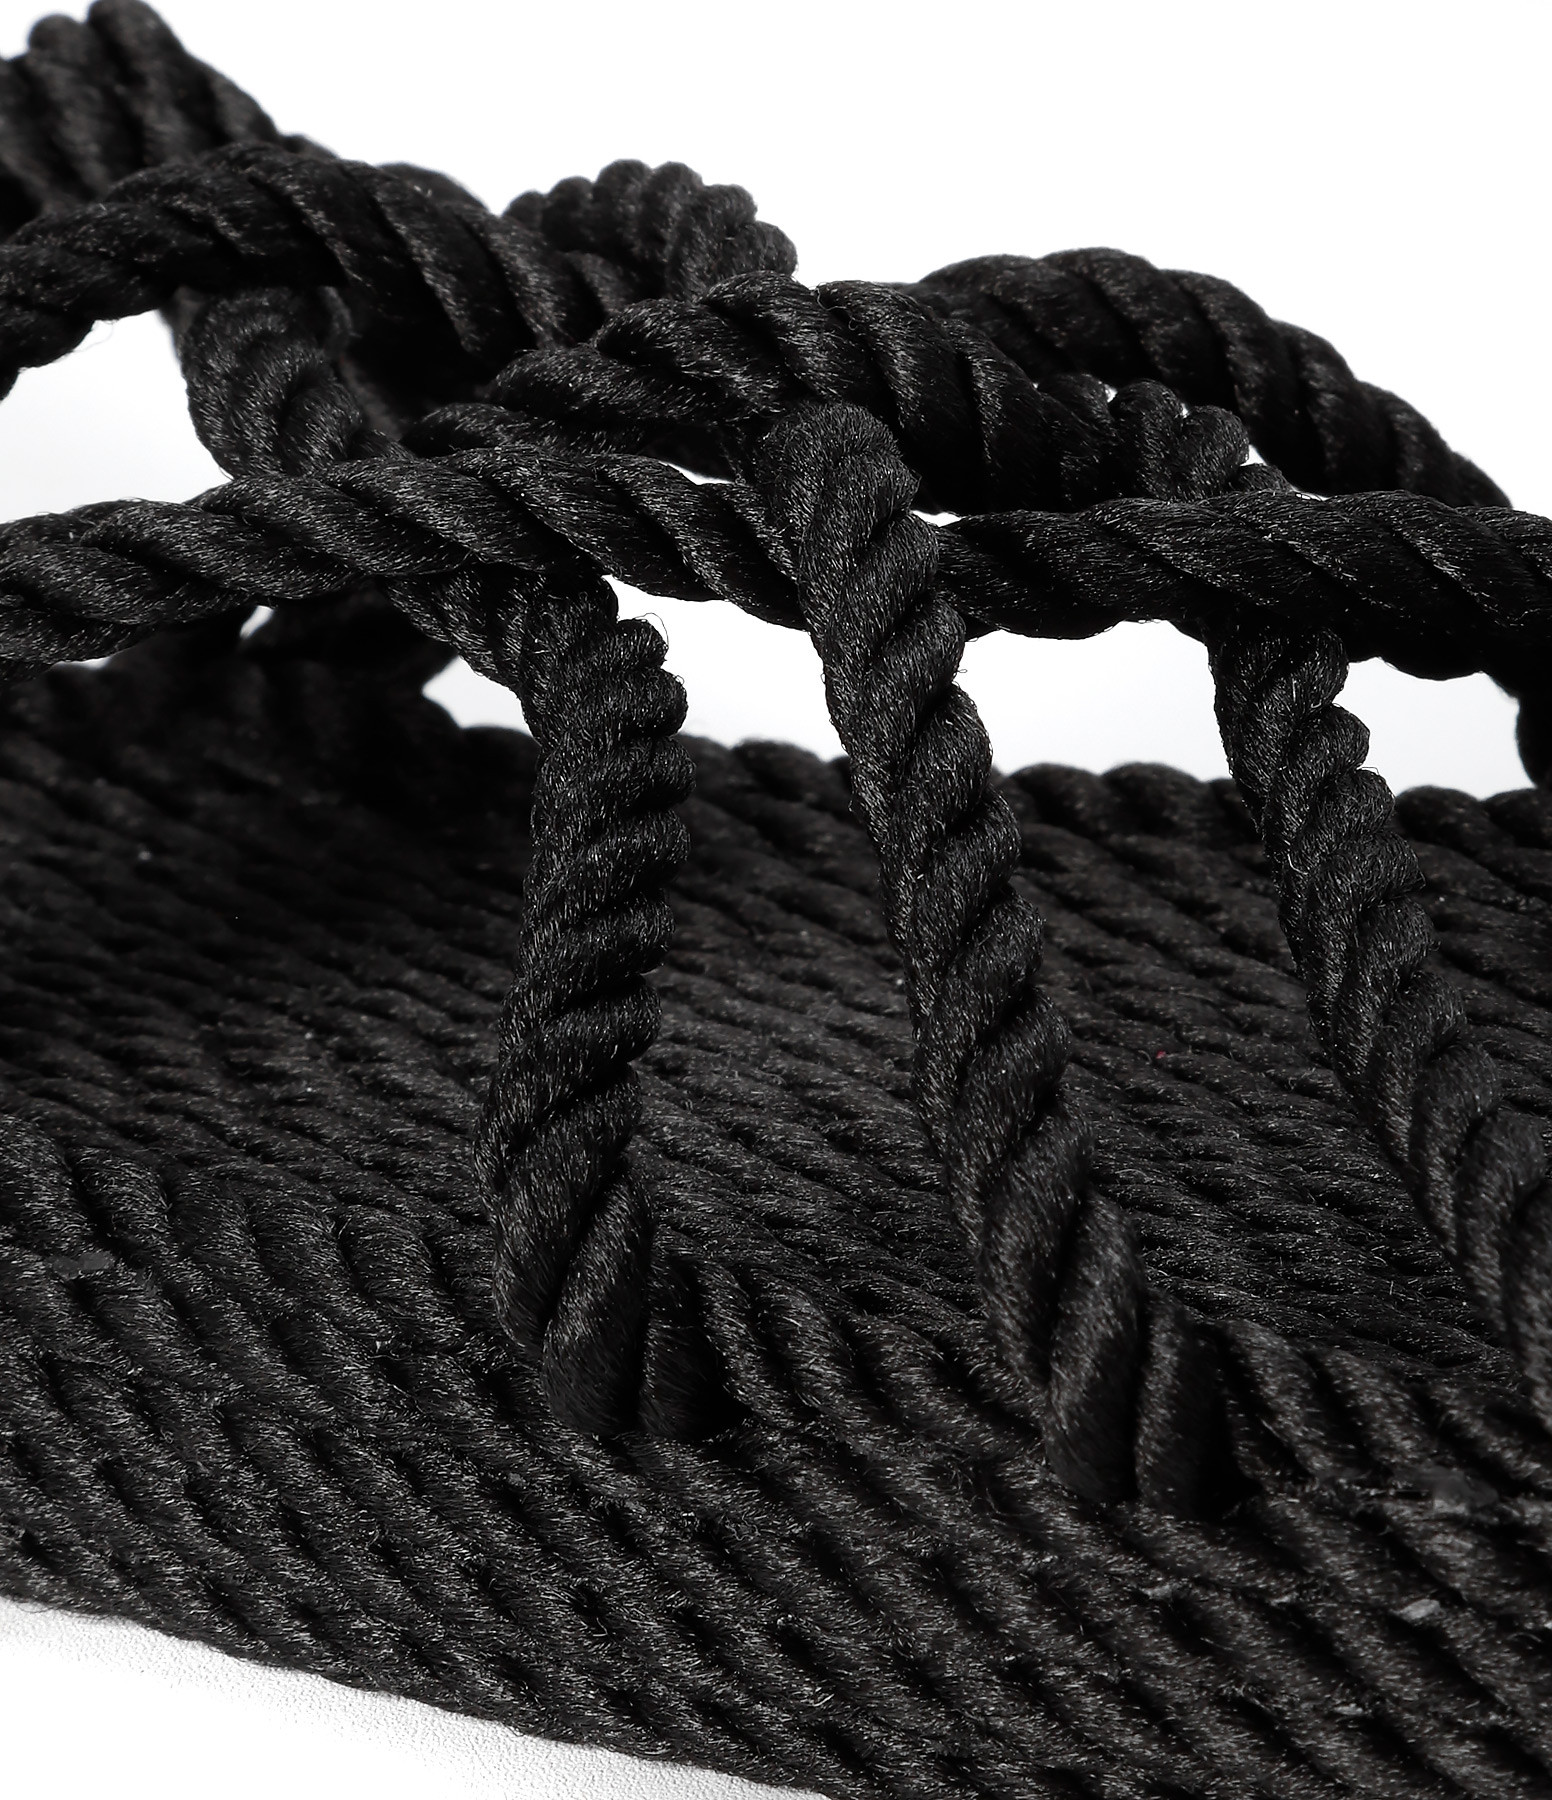 NOMADIC STATE OF MIND - Sandales Vegan JC Plateforme Corde Noir